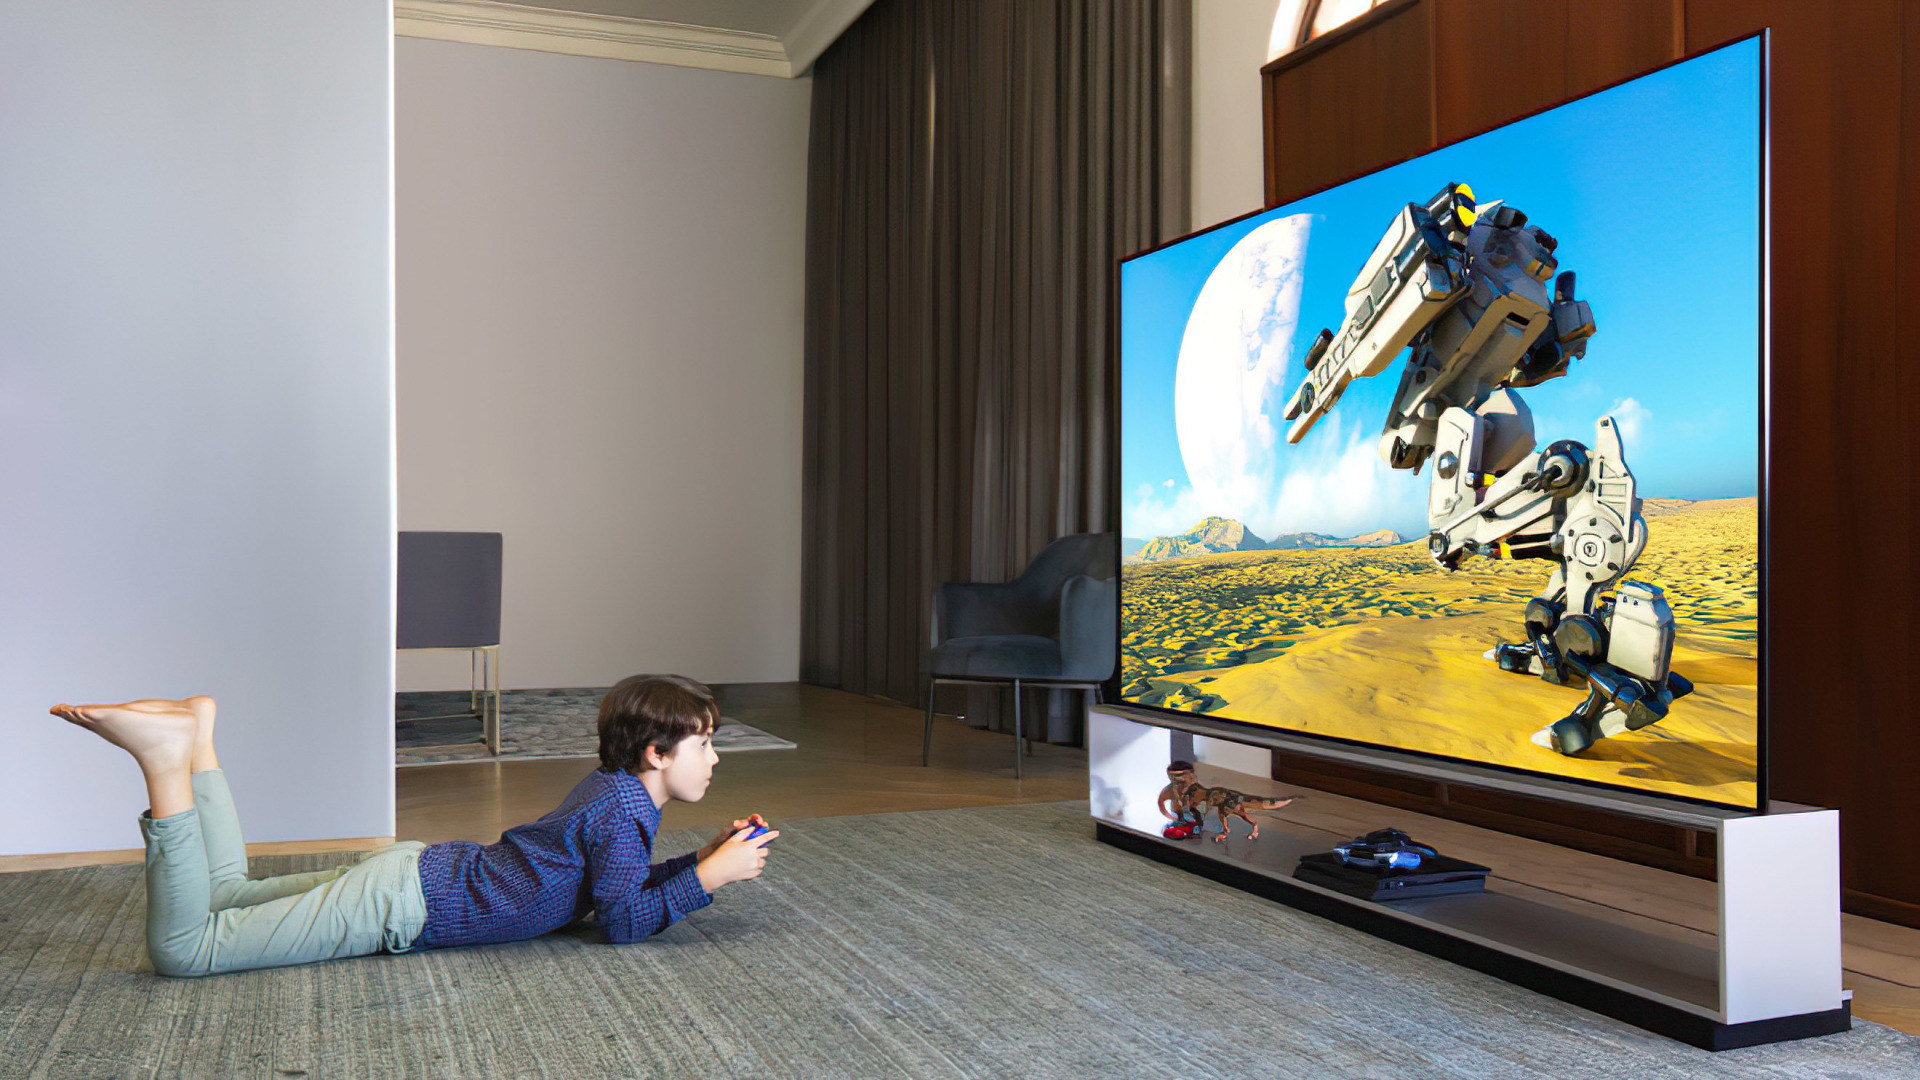 Gaming, Spiele, Konsole, Tv, LG, Fernseher, Spielekonsole, OLED, LG Electronics